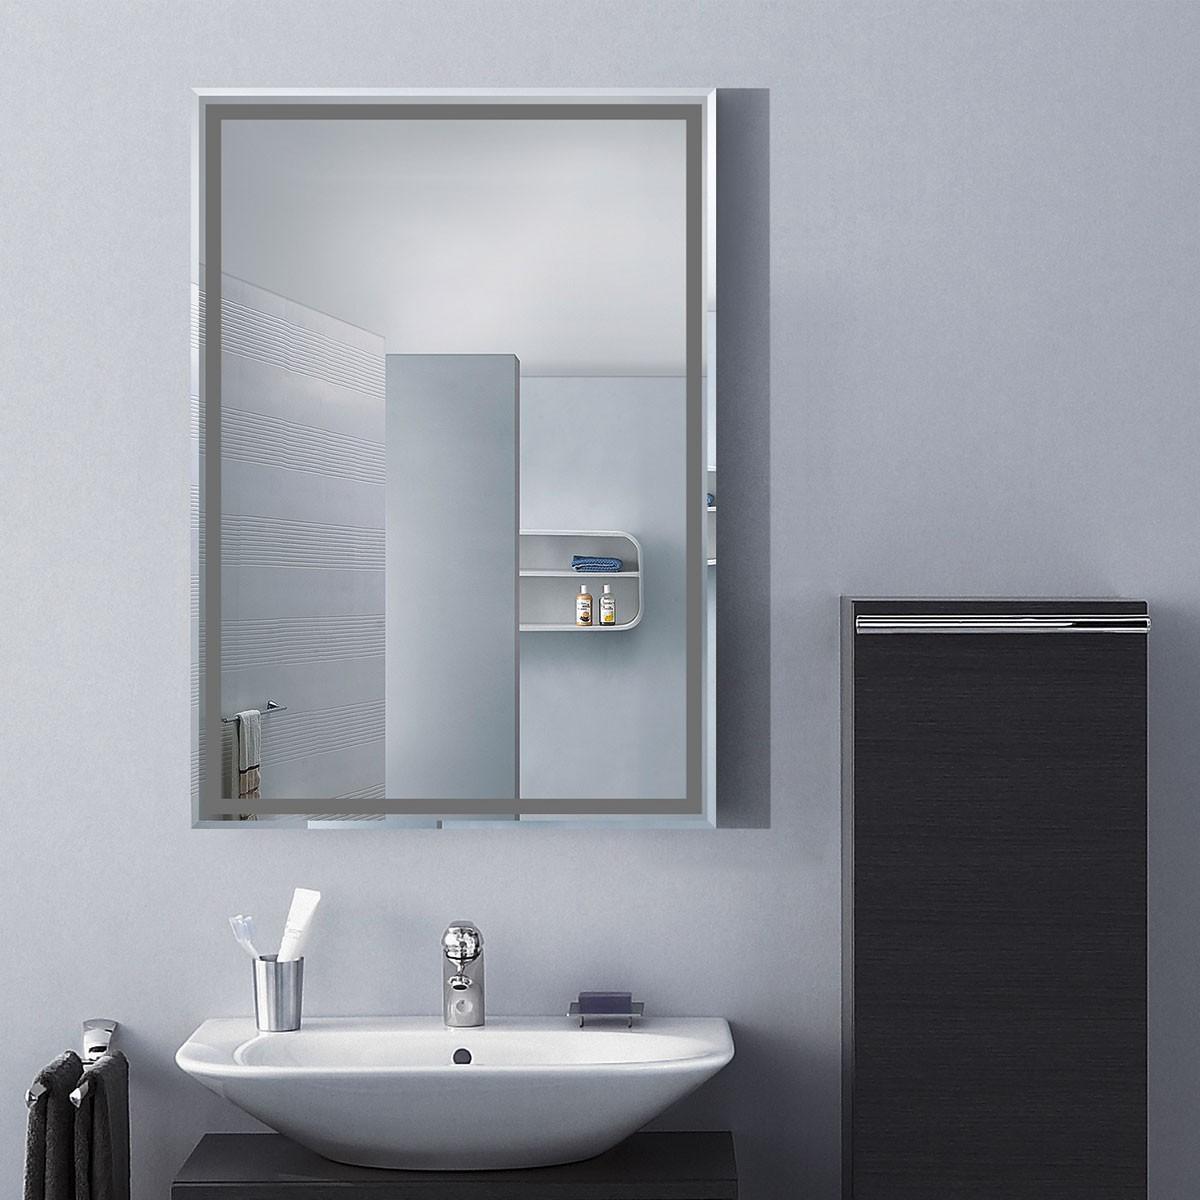 28 x 20 po miroir mural salle de bain classique for Miroir mural salle de bain